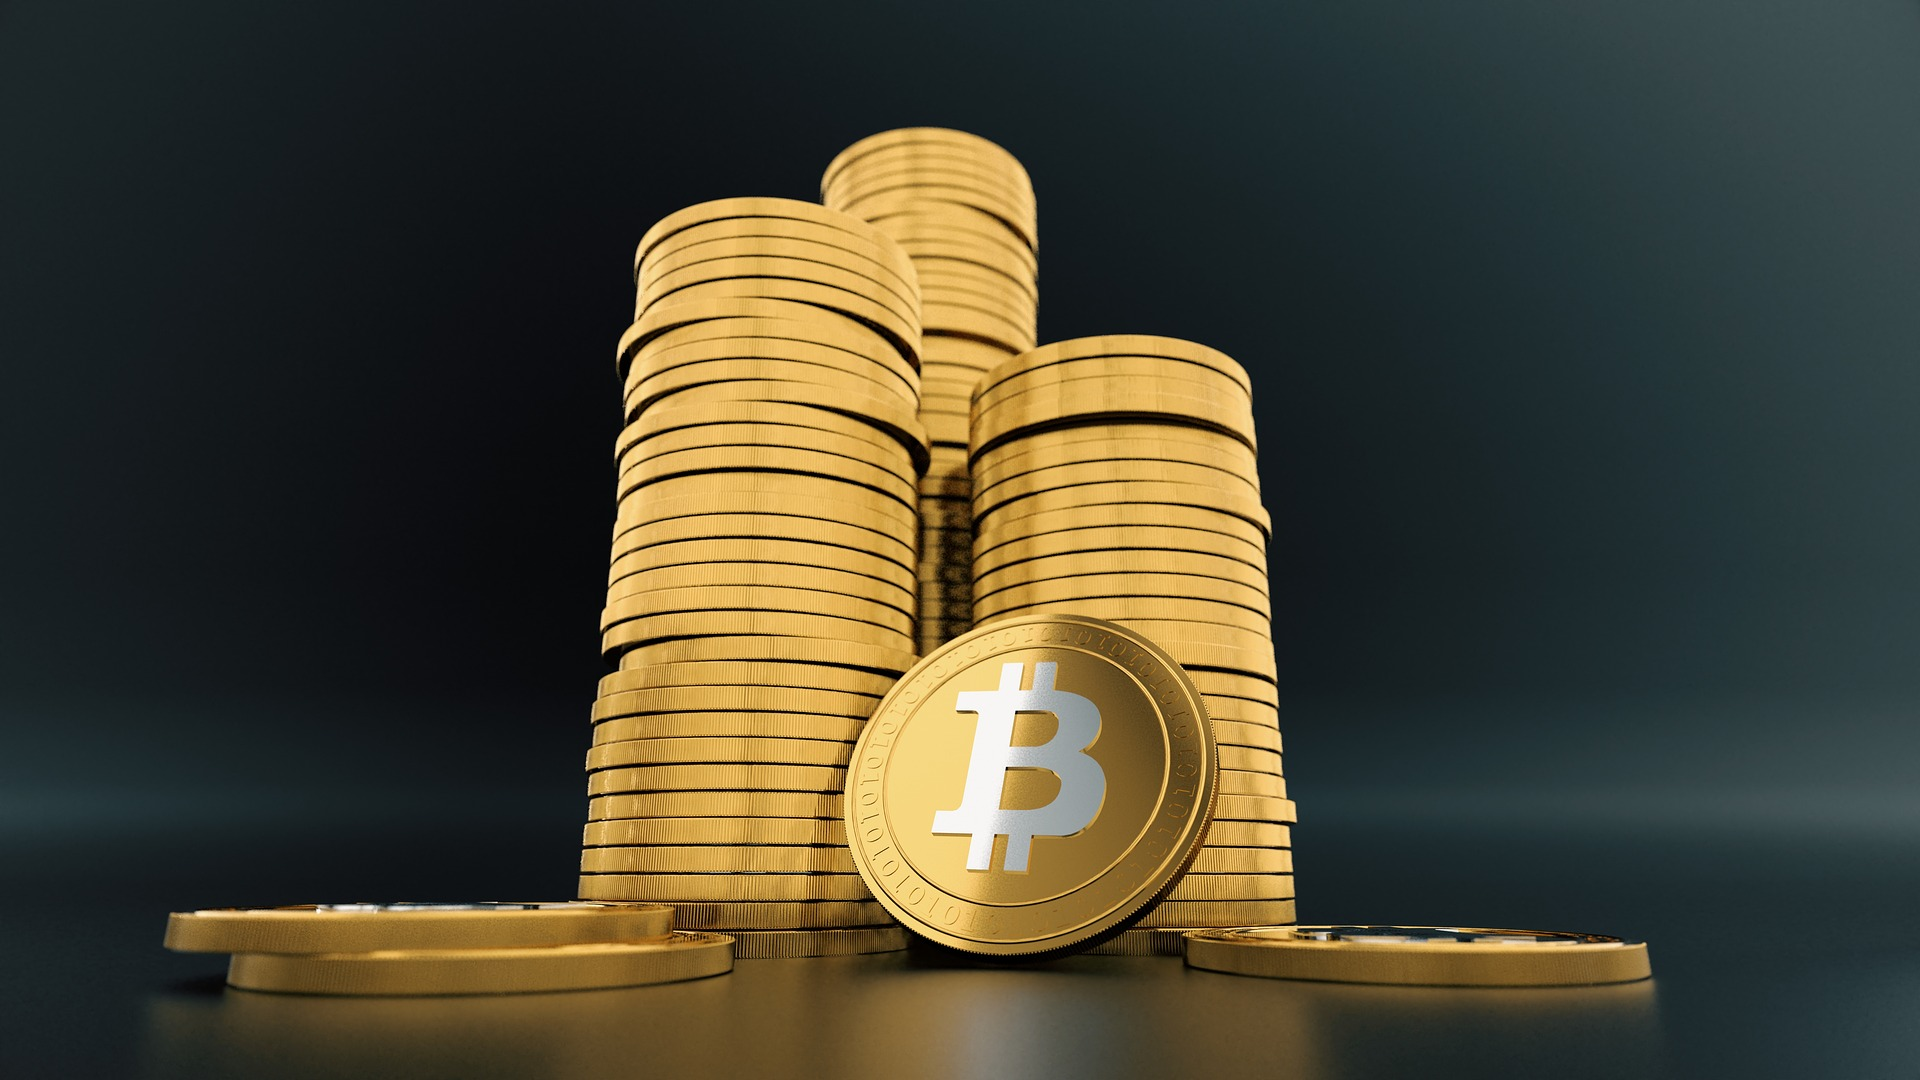 Vidoma ukraїnśka kryptobirža prodaje Bitcoin Cash za gryvni, na čerzi — Ripple